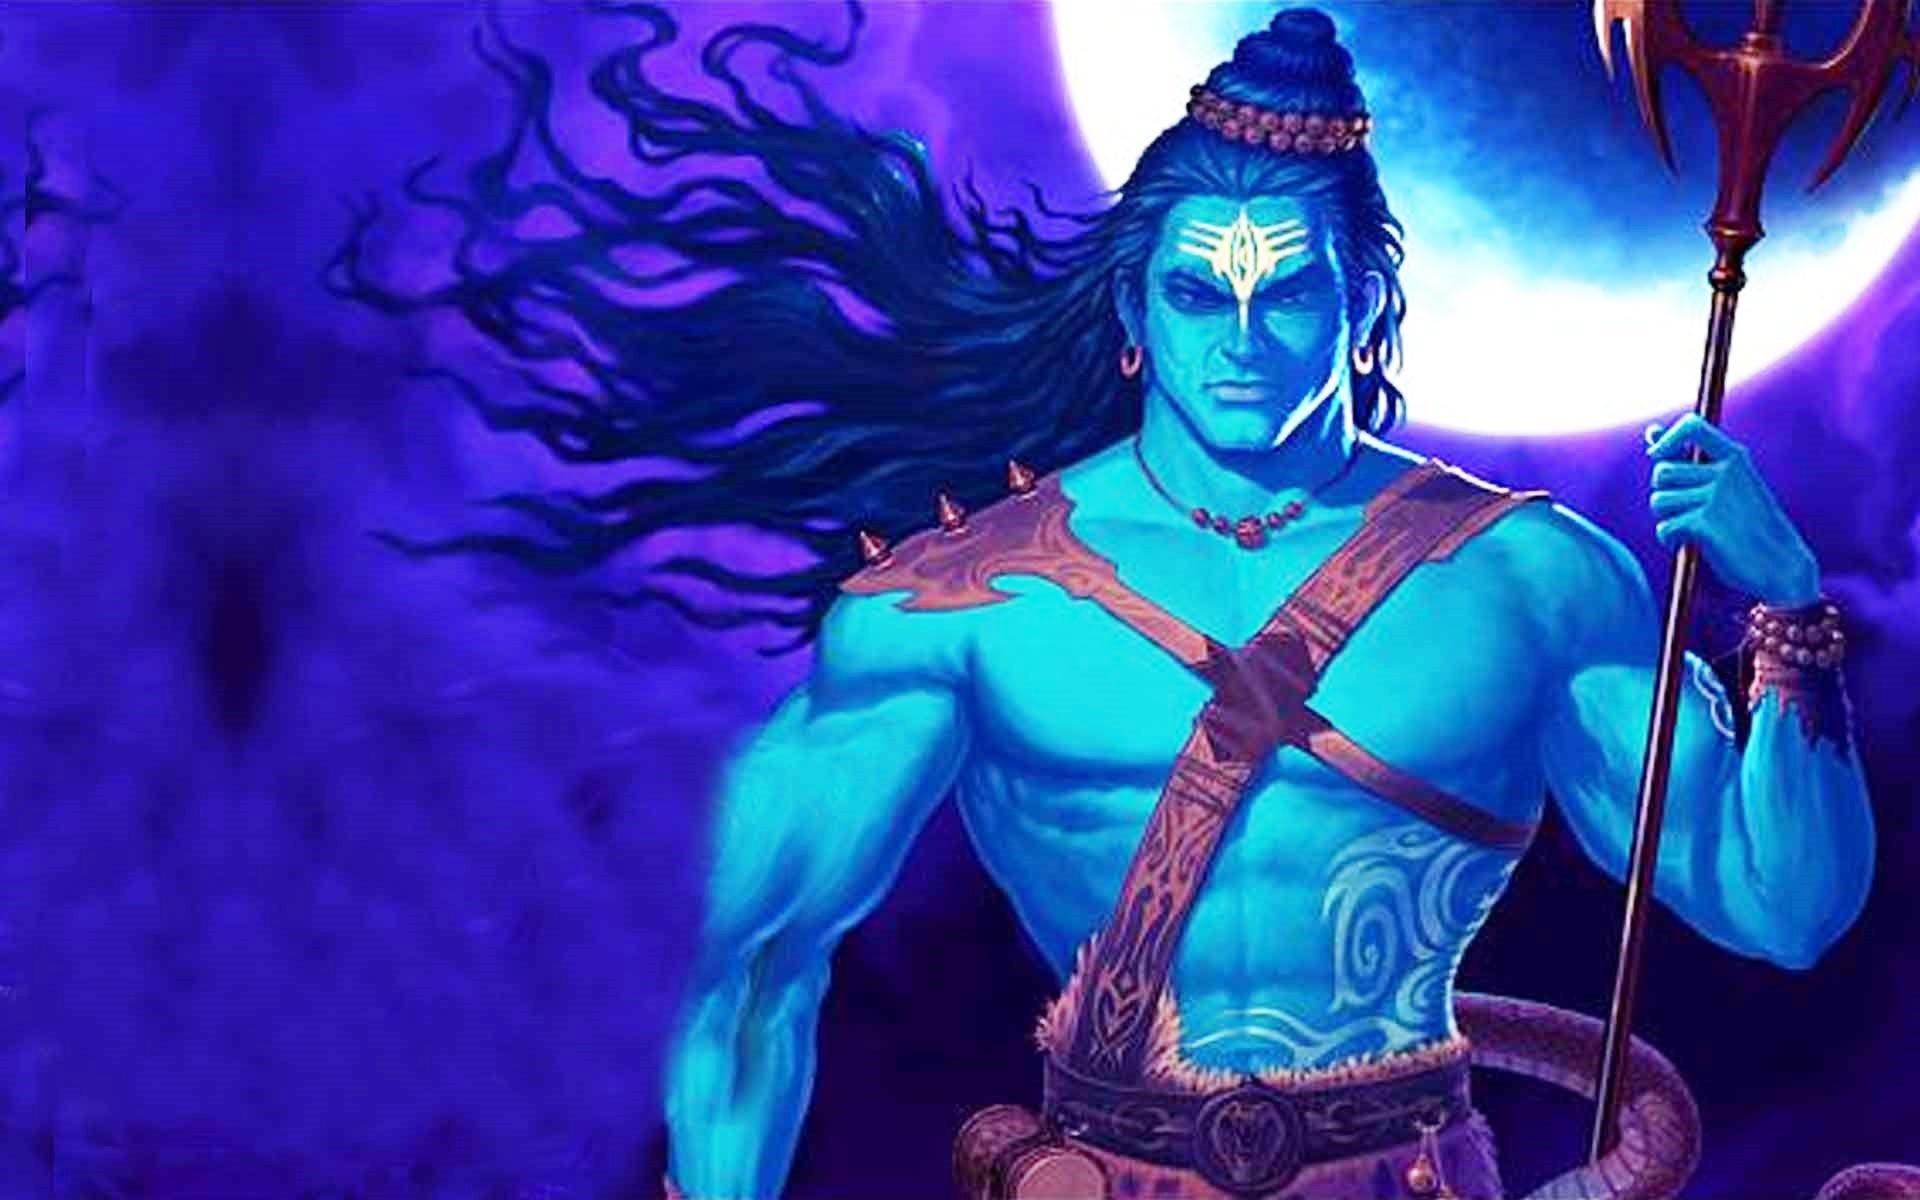 Lord Shiva animated full hd image